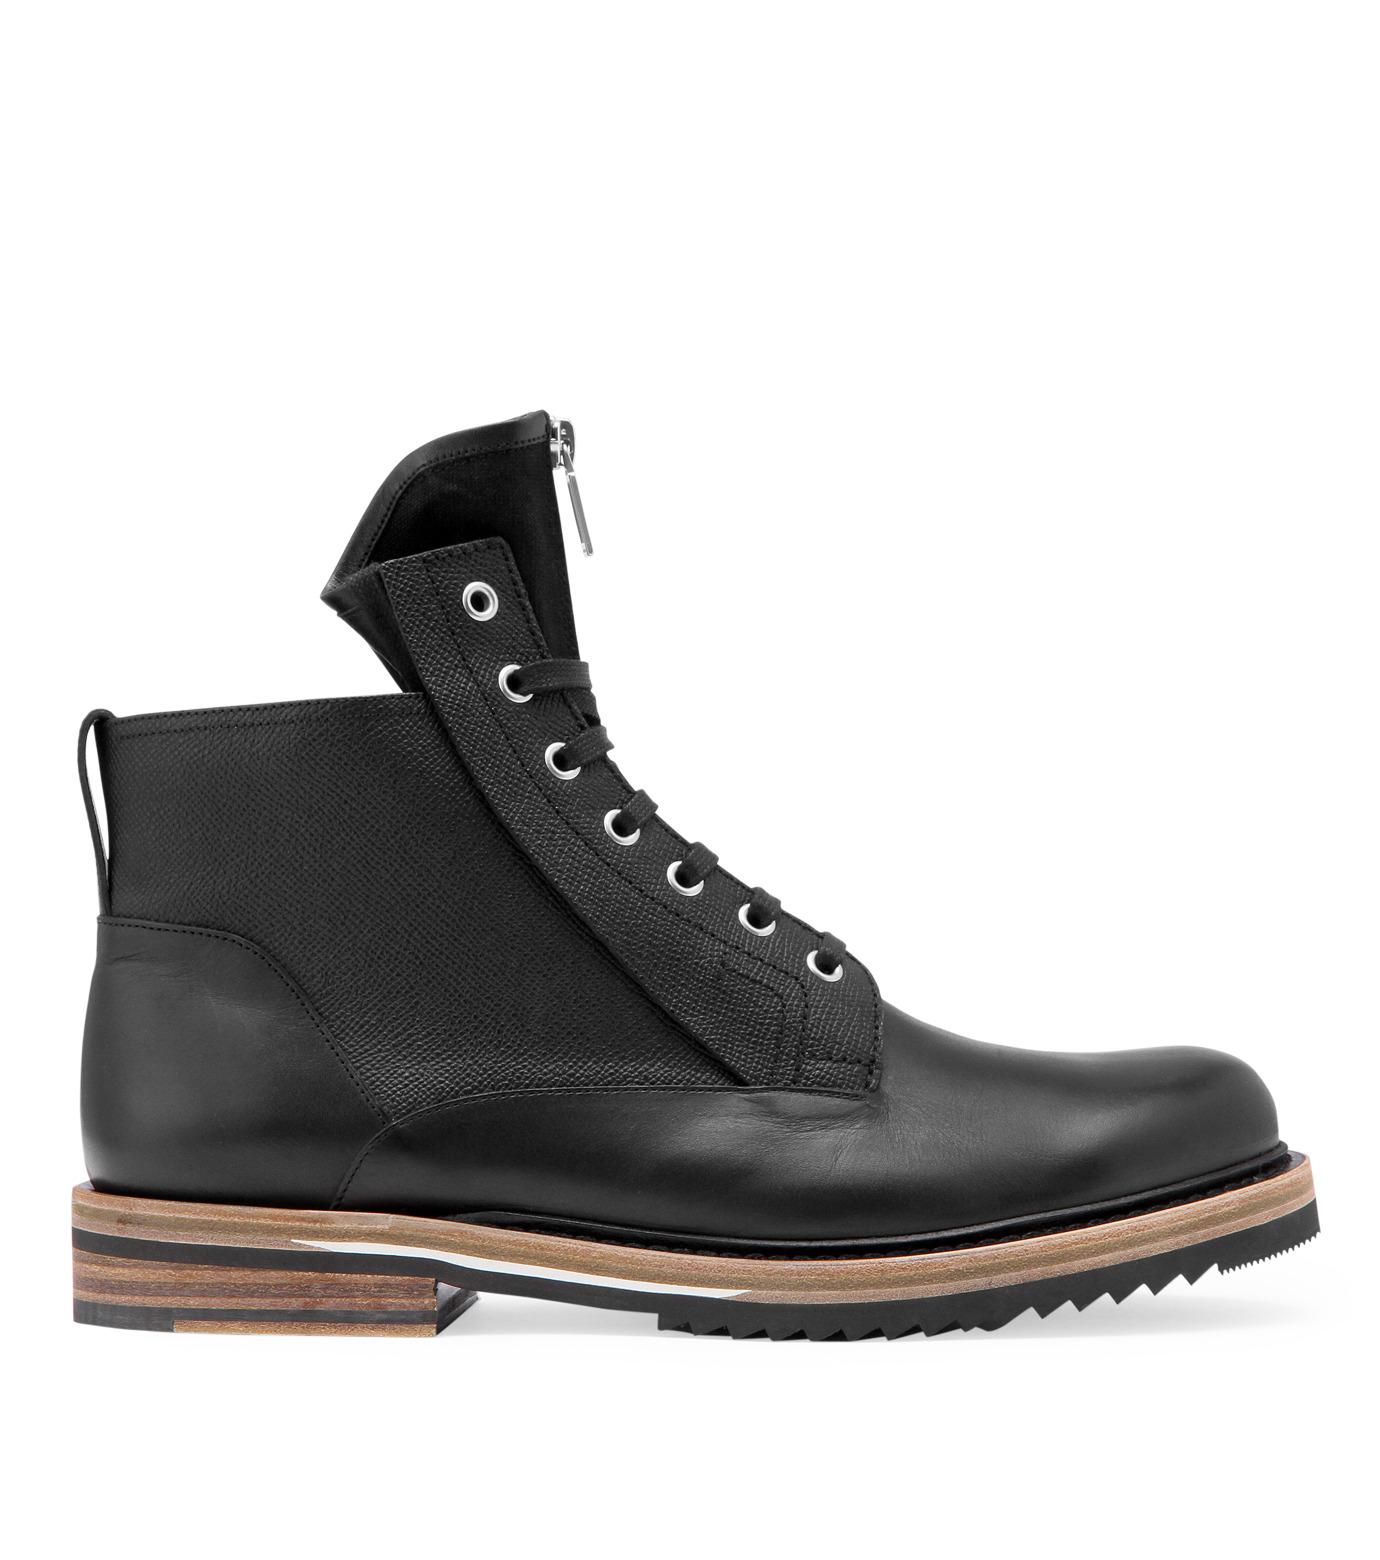 Dior Homme(ディオール オム)のCollection boots-BLACK-3BO080VDZ-13 拡大詳細画像1